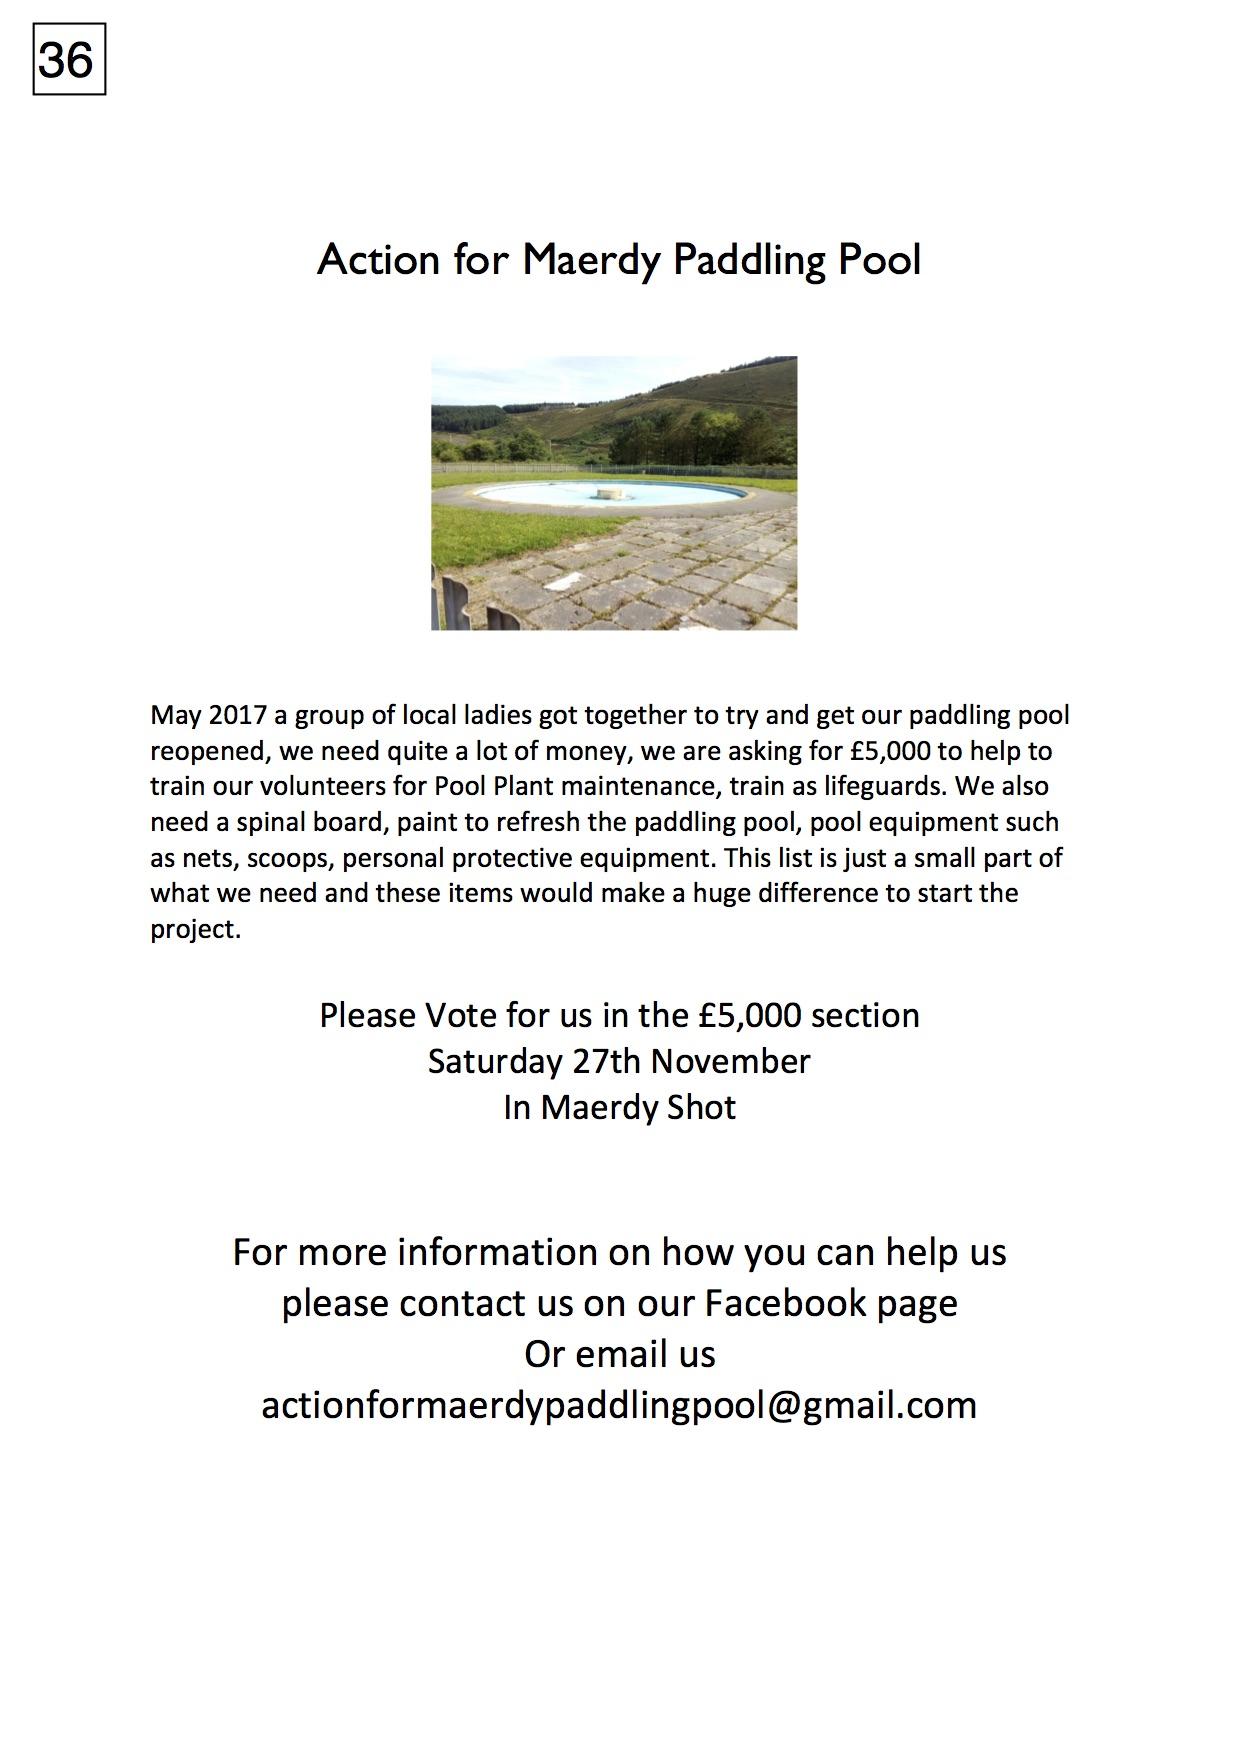 36. Maerdy Paddling Pool - Poster - 221017